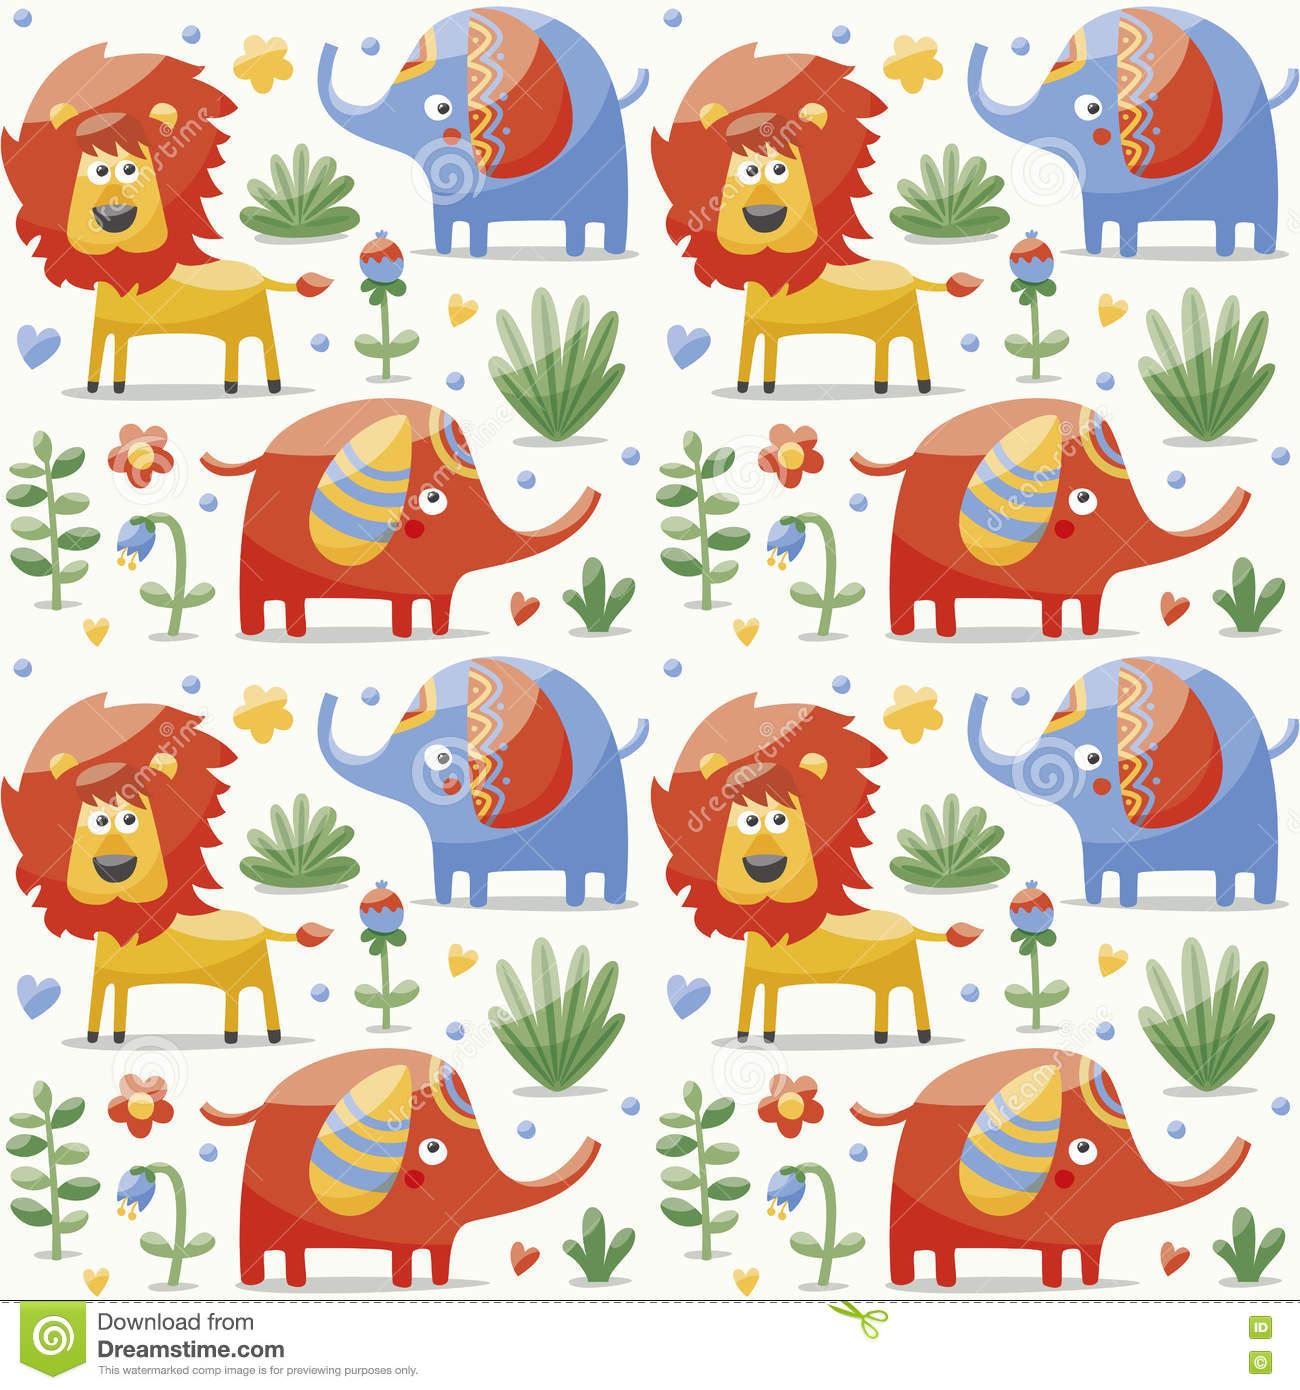 Seamless Cute Pattern Made With Elephants, Lion,giraffe, Birds.